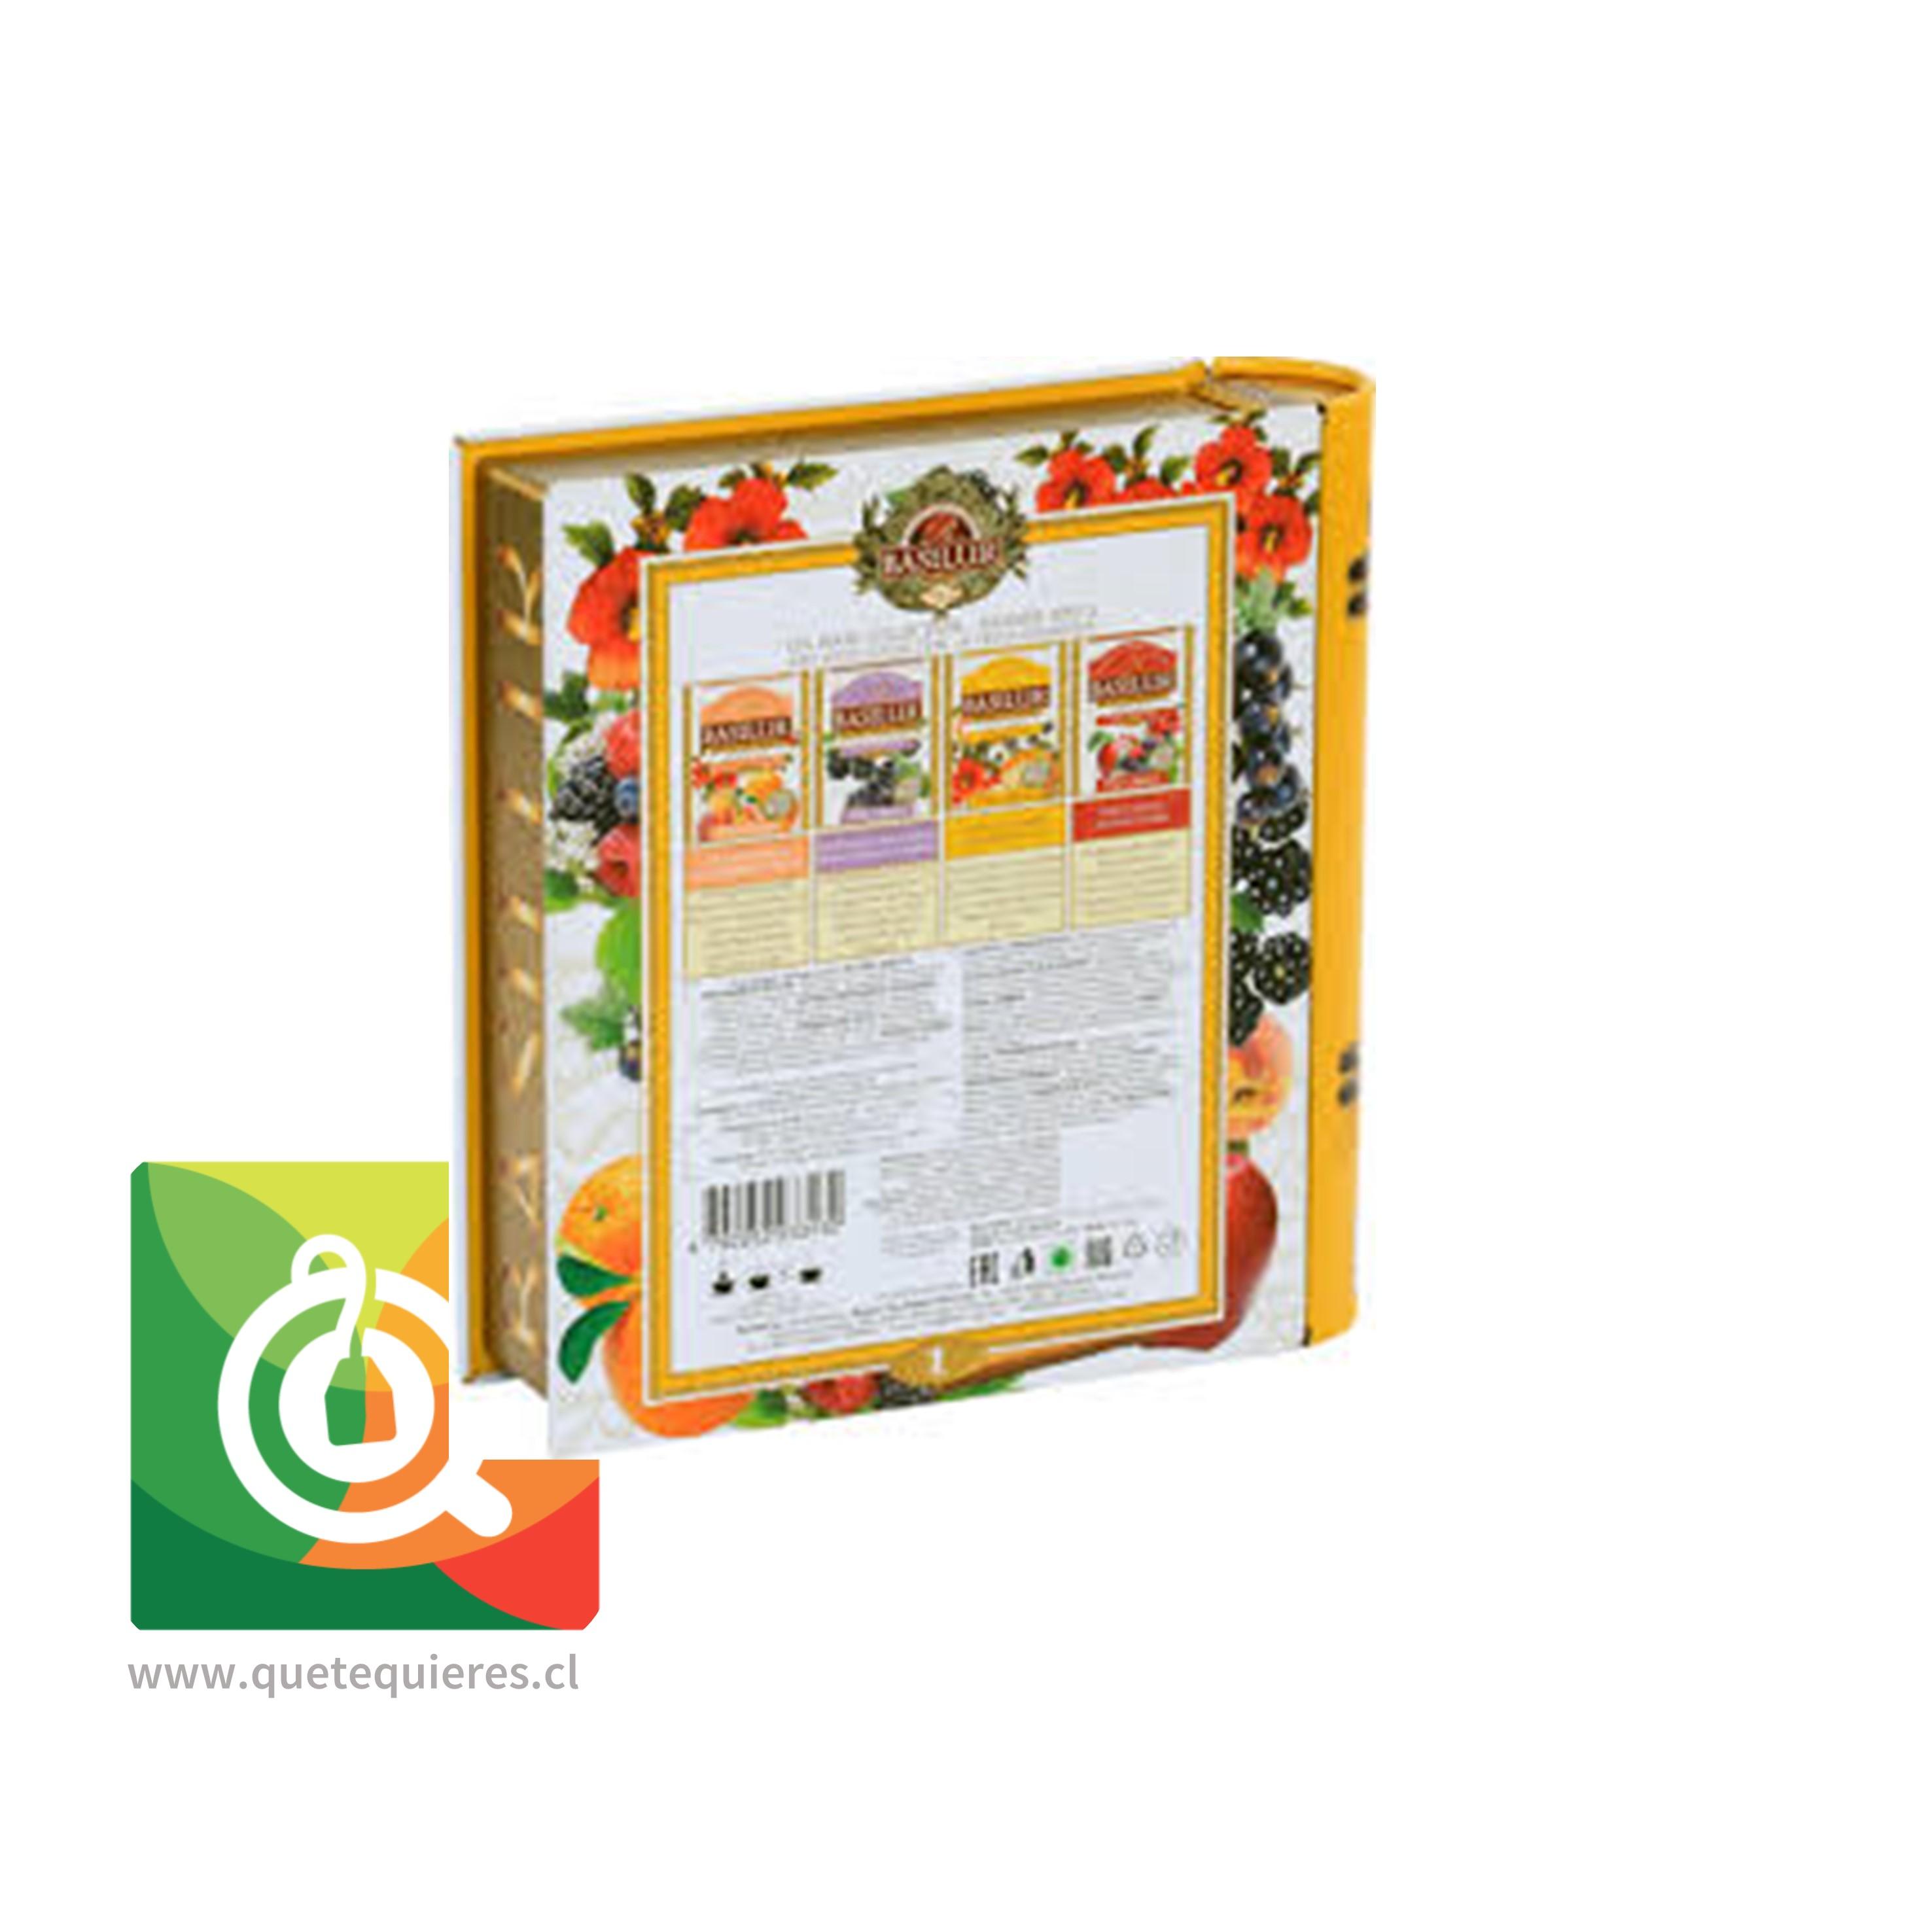 Basilur Libro Té Surtido Infusiones Frutales - Fruit infusion 1 Tea Book Assorted- Image 2